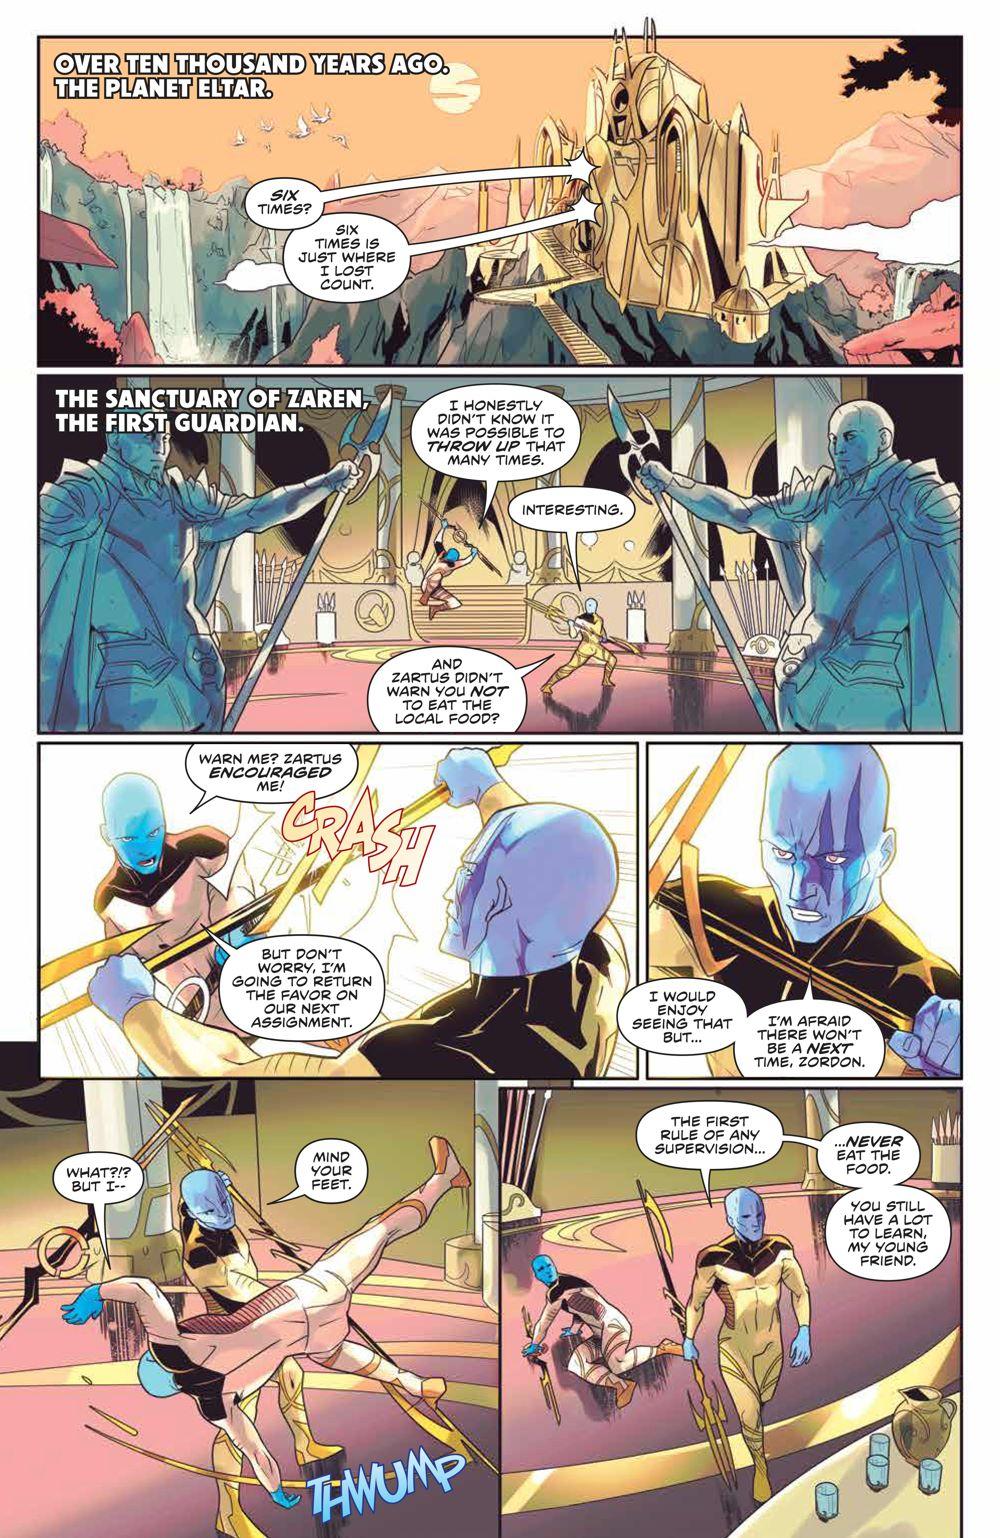 MightyMorphin_004_PRESS_3 ComicList Previews: MIGHTY MORPHIN #4